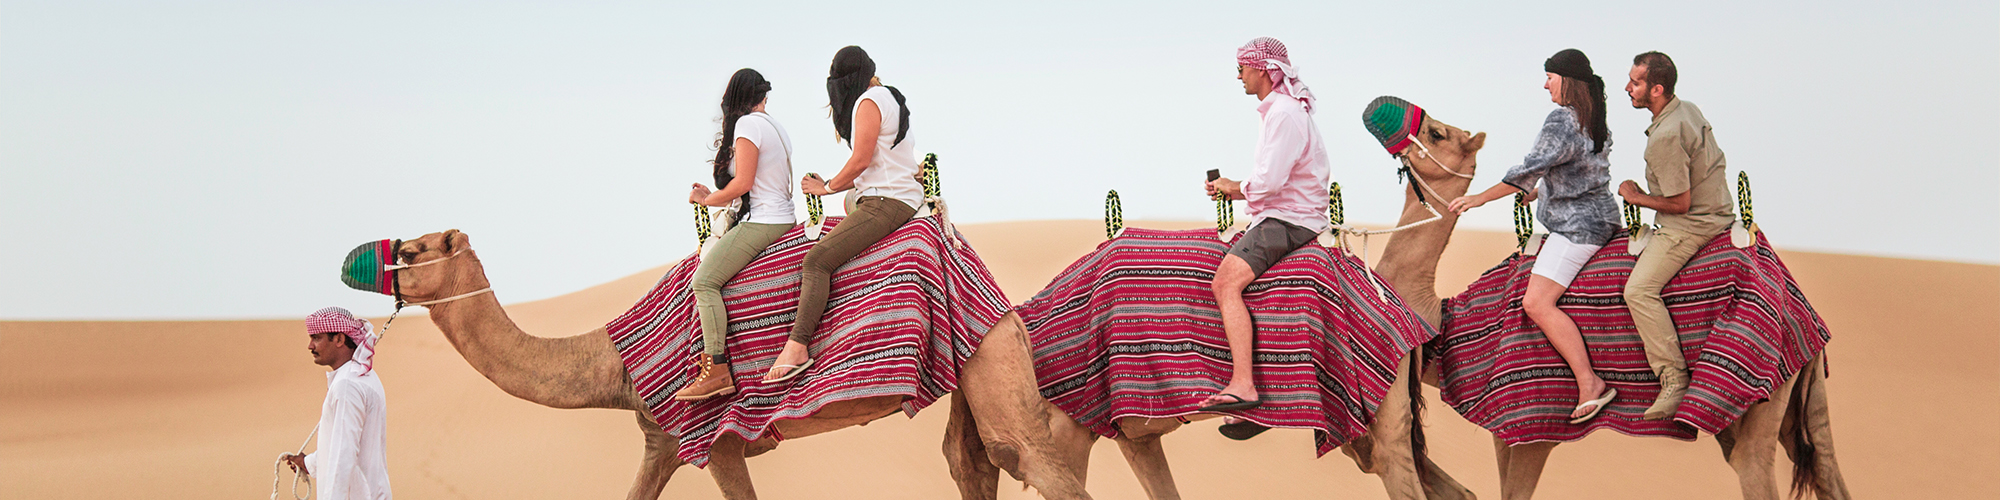 Marsa Alam Safari Trips -Safari Trips From Marsa Alam - Tours From Hurghada